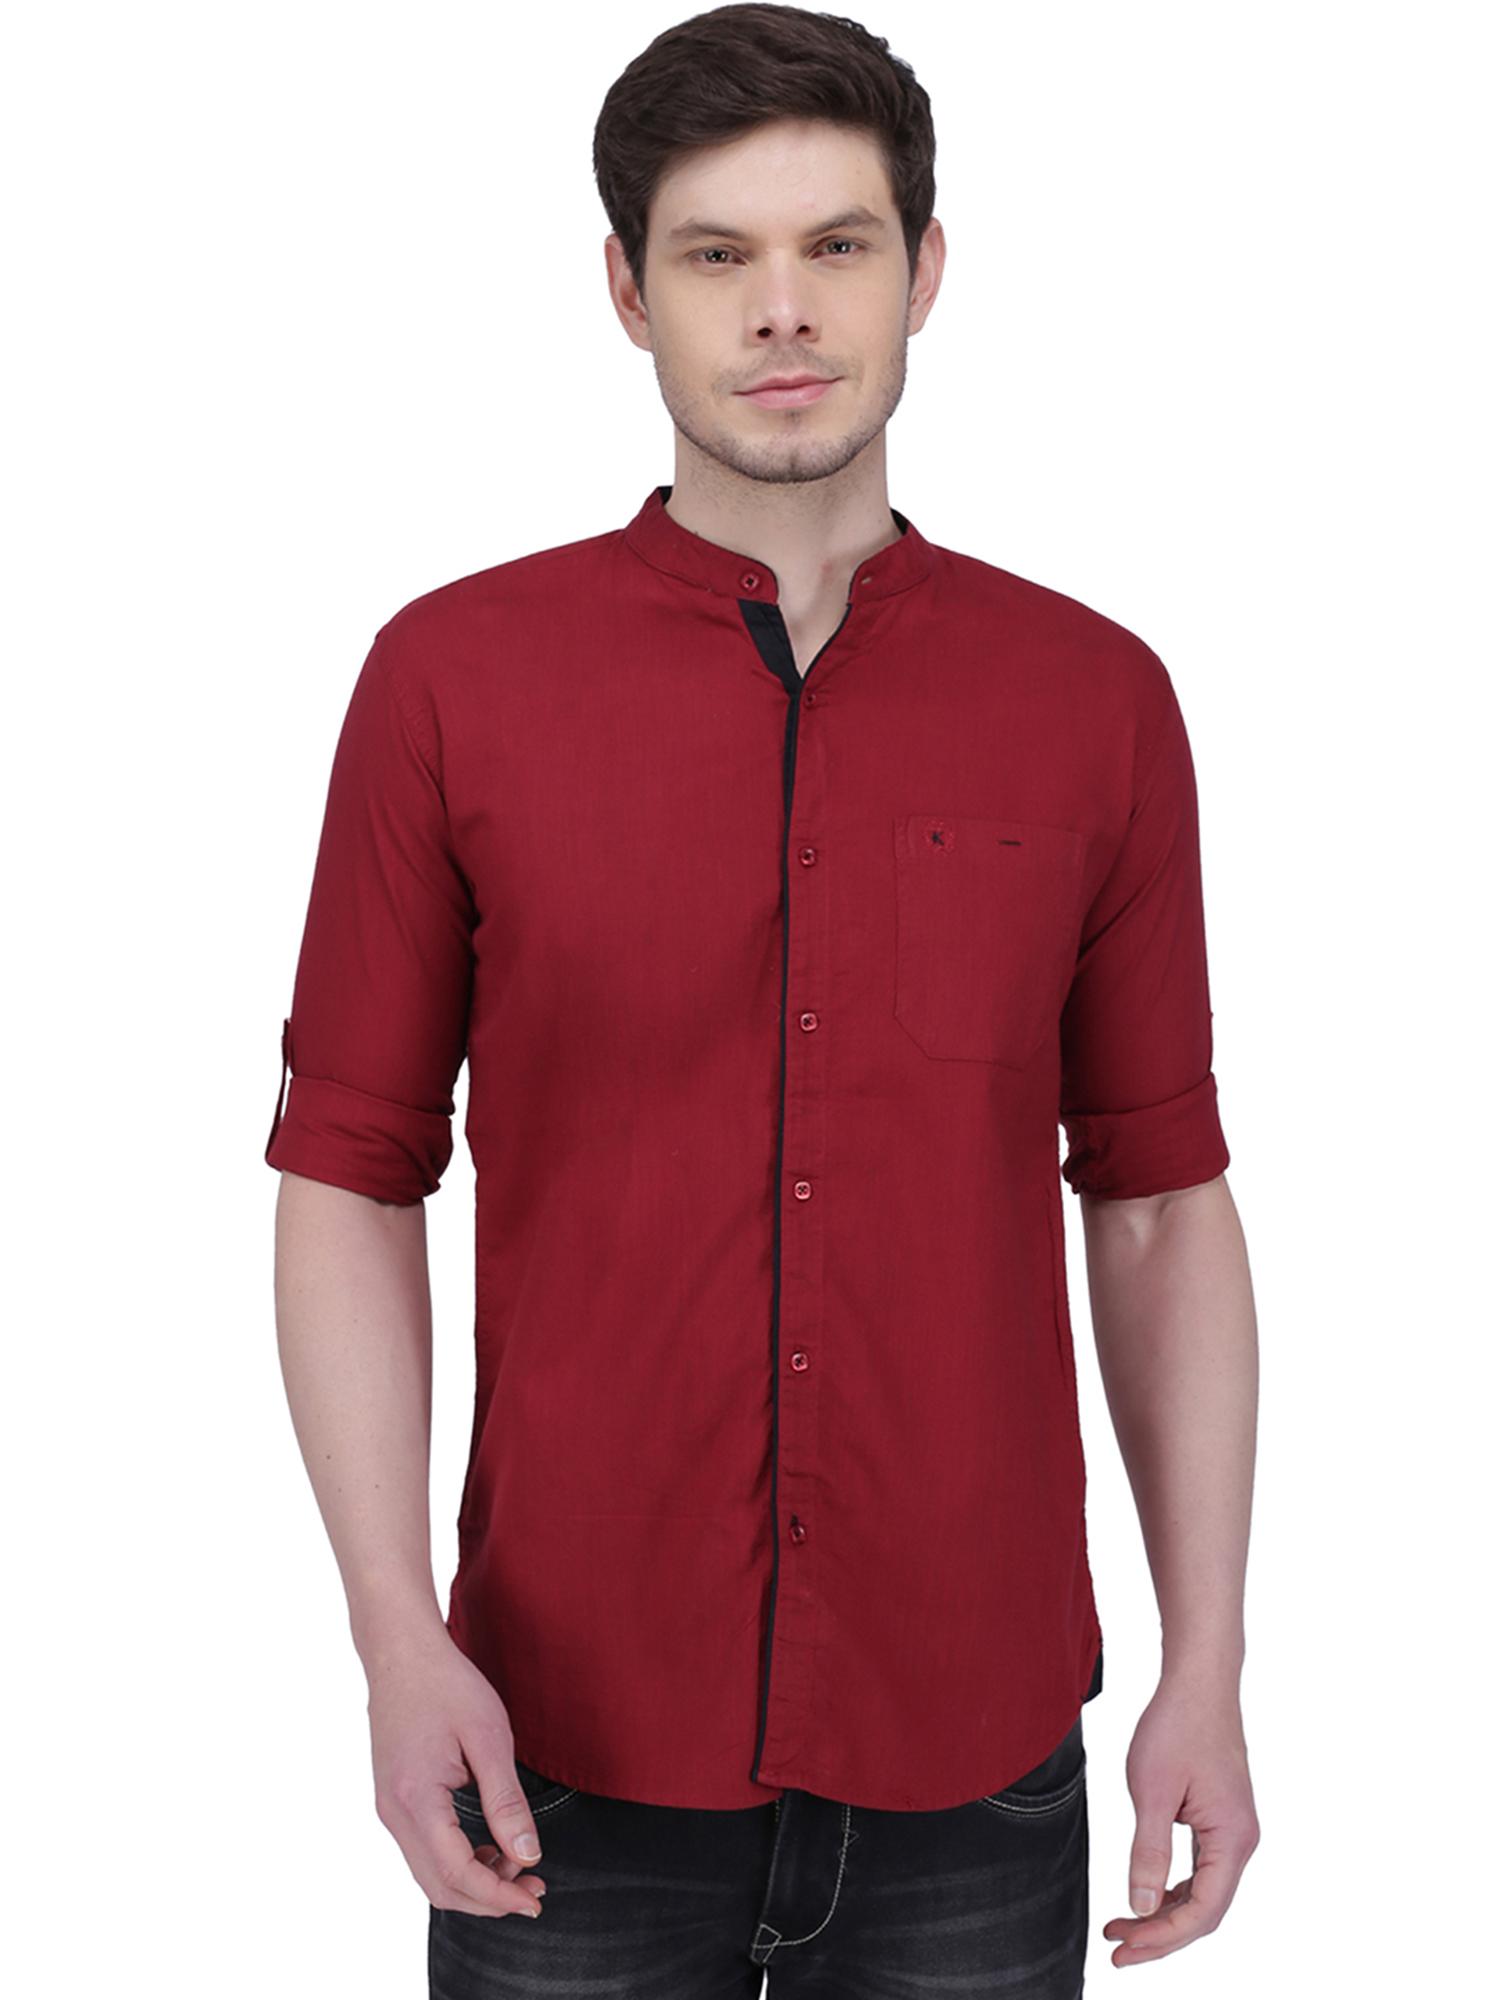 Kuons Avenue | Kuons Avenue Men's Maroon Linen Cotton Casual Shirt- KACLFS1289MA